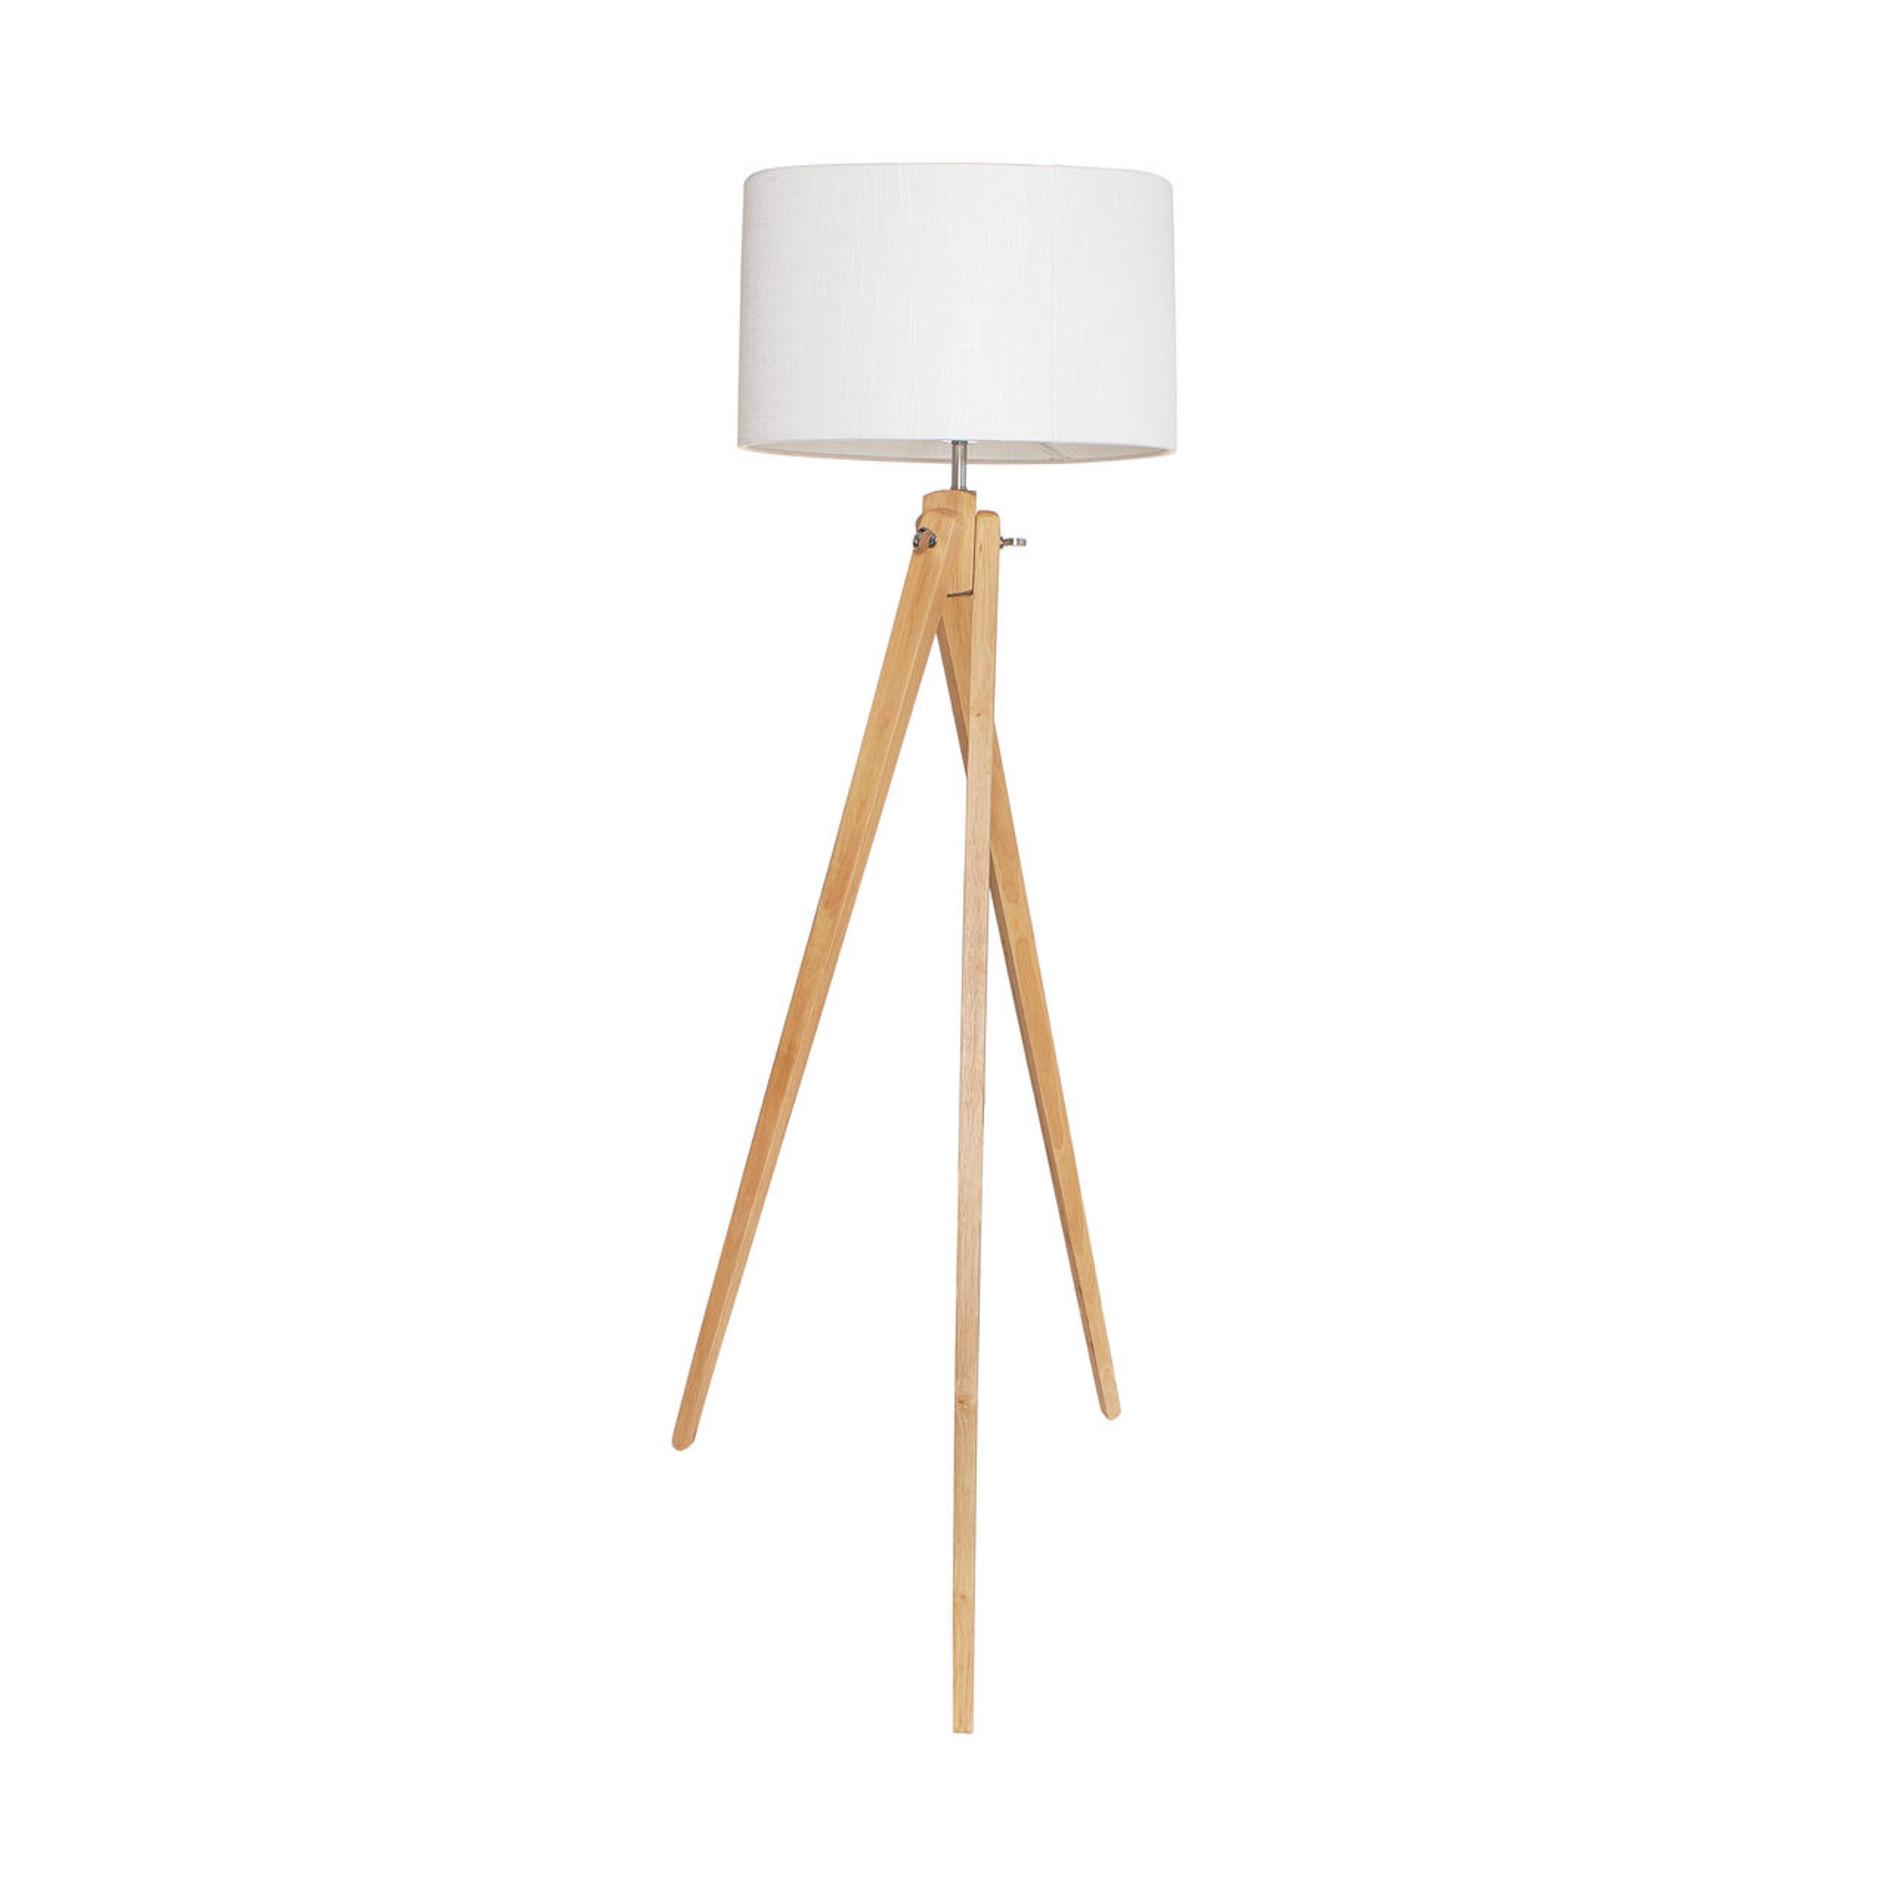 Spider Lampada da terra, Bianco/Marrone, large image number 0